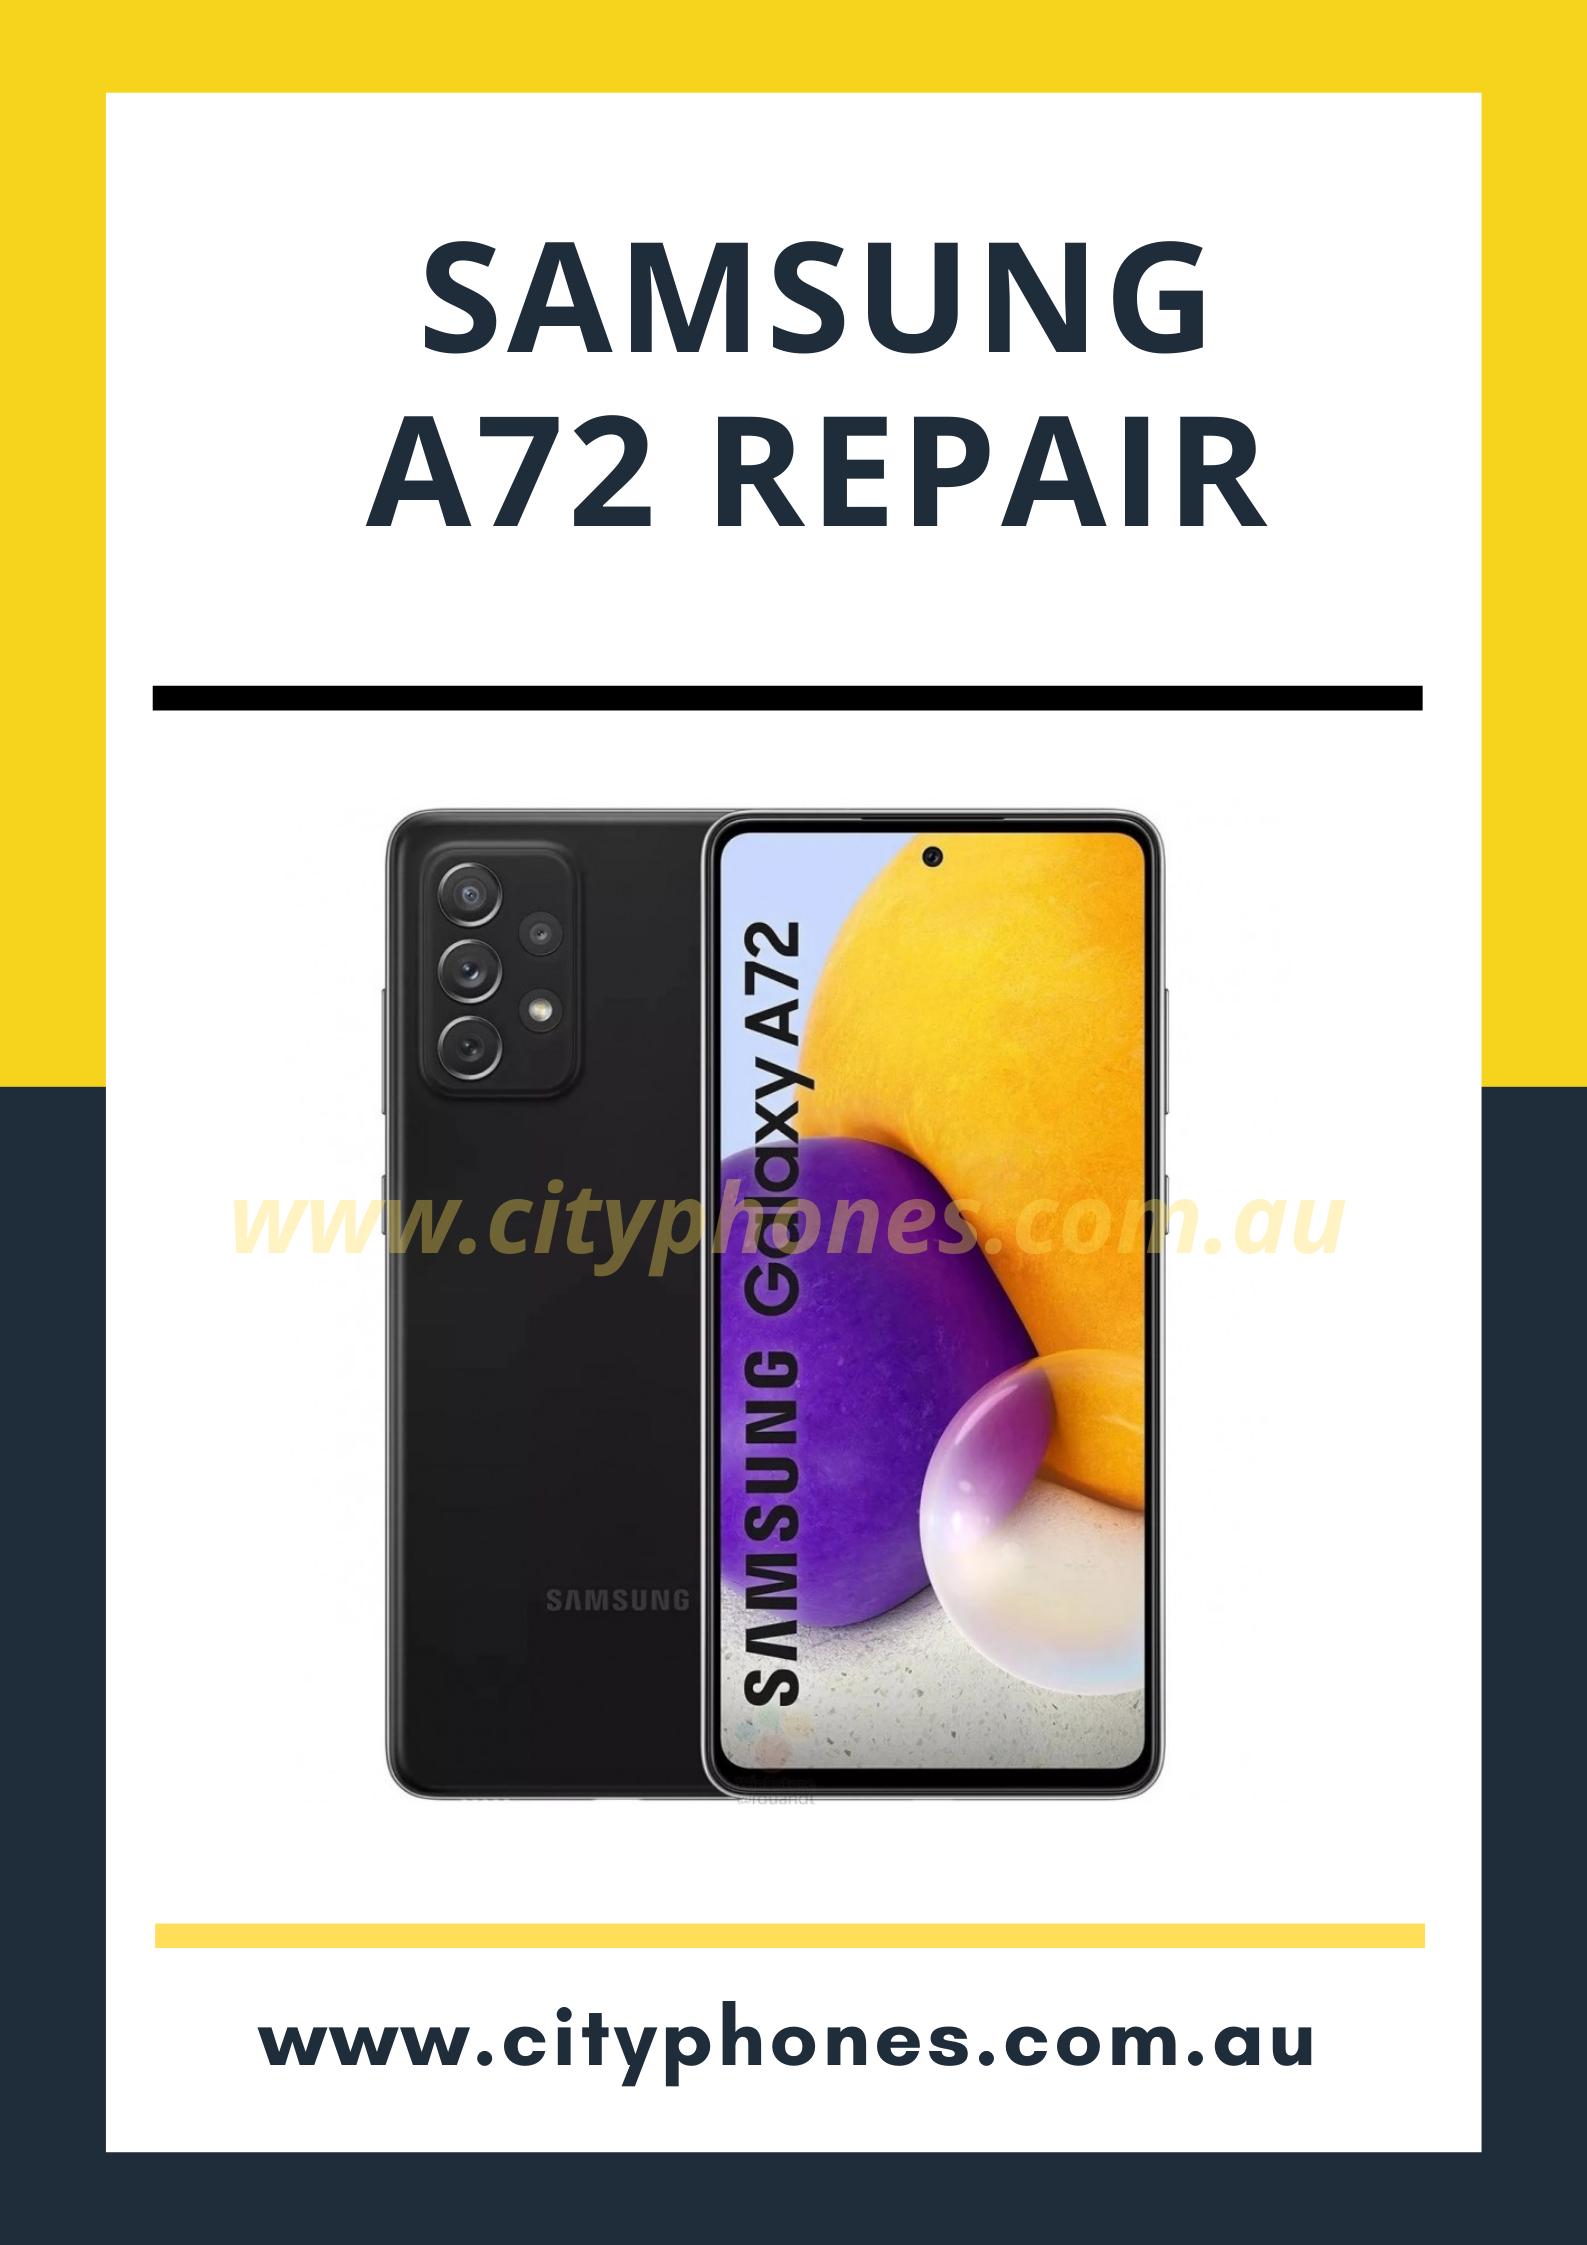 Samsung A72 repair cost